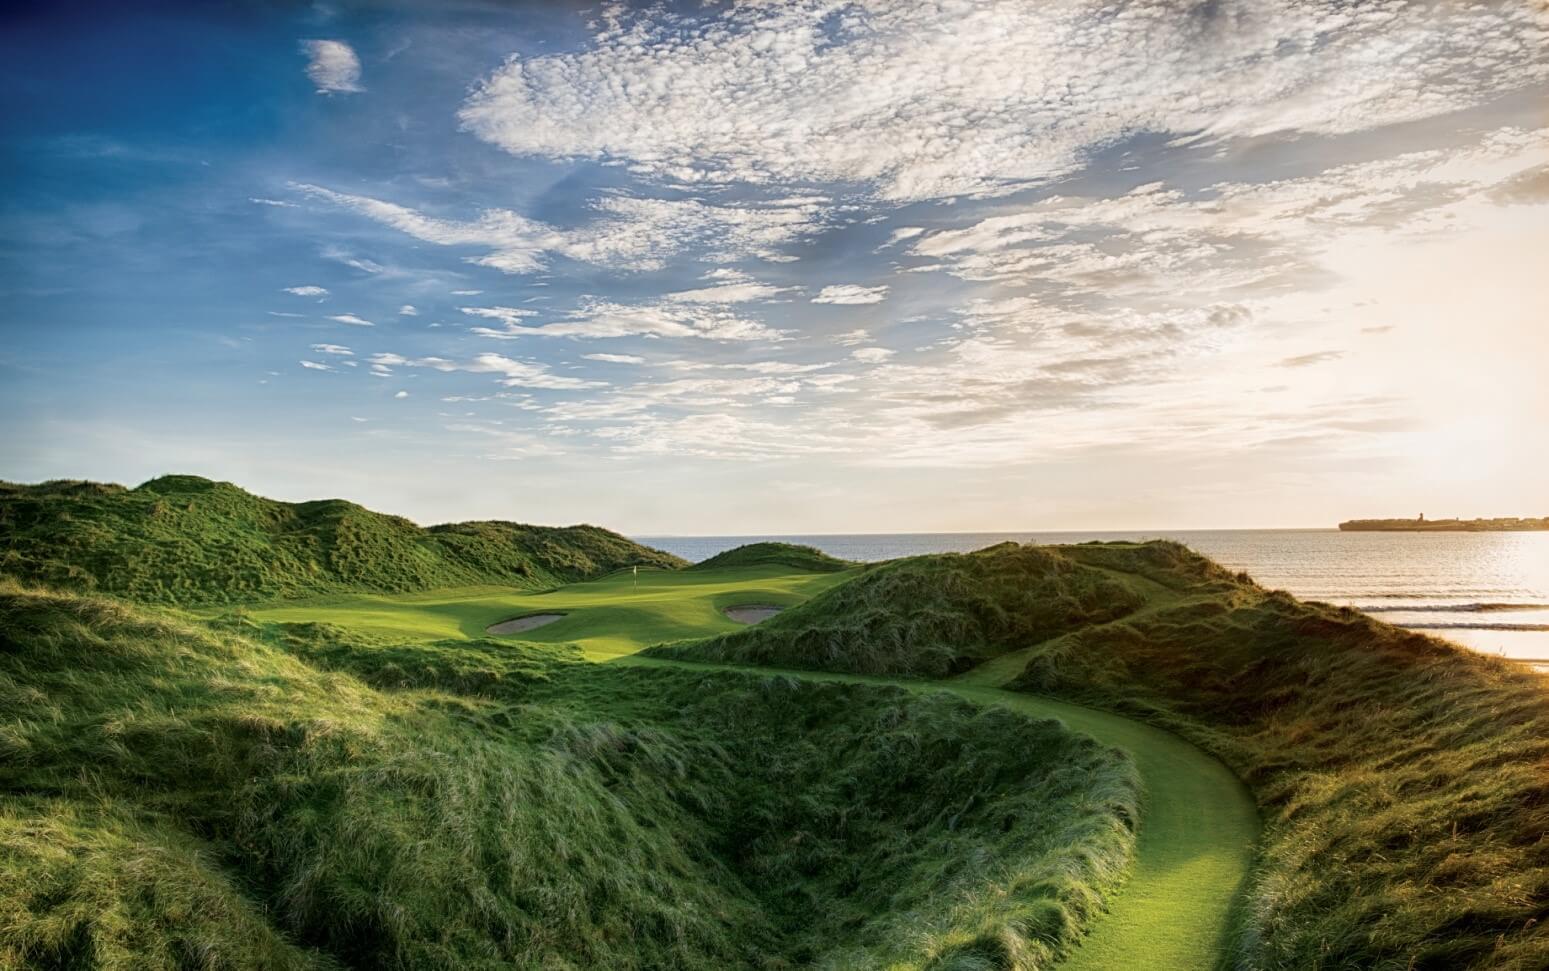 Ireland's best 100 golf courses feature many along the Wild Atlantic Way - Atlantic Way Golf Tours